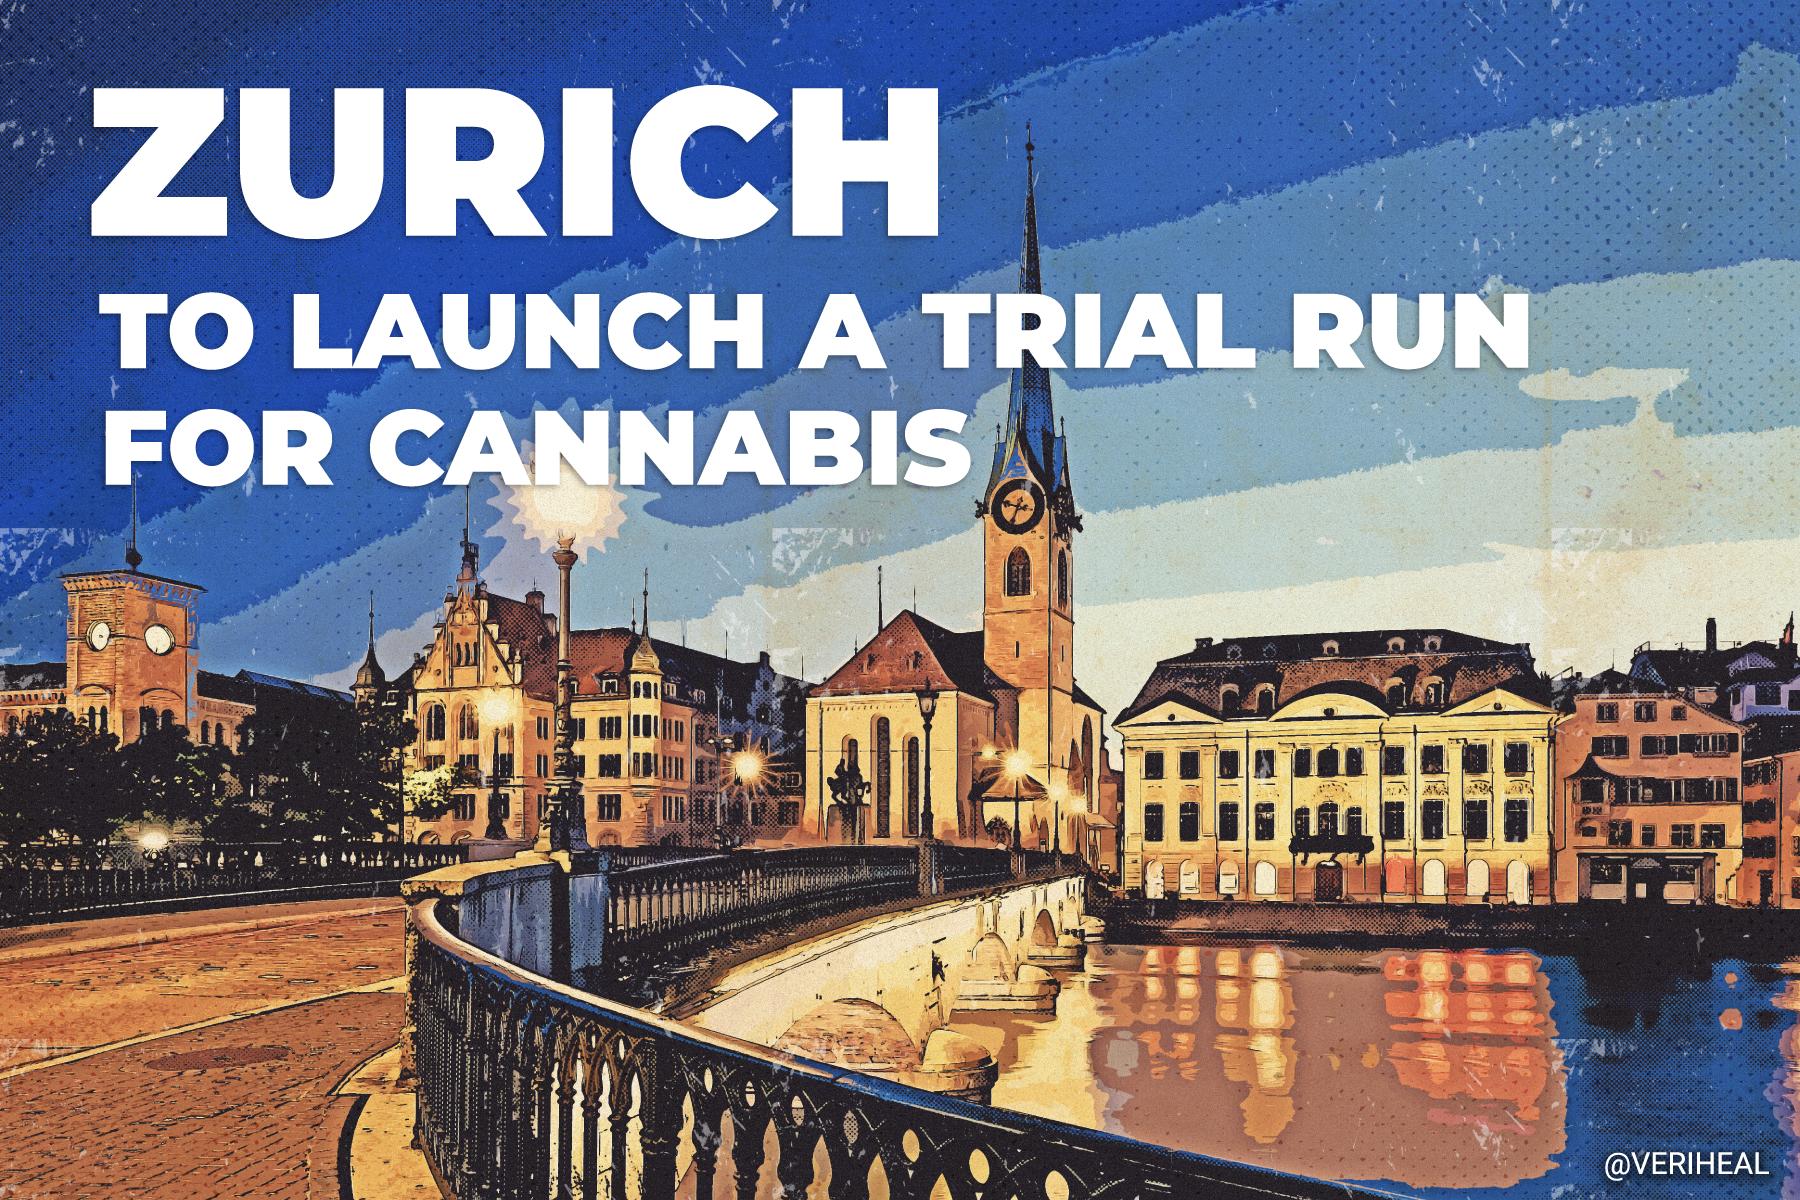 Zurich Is Launching a Trial Run for Recreational Cannabis